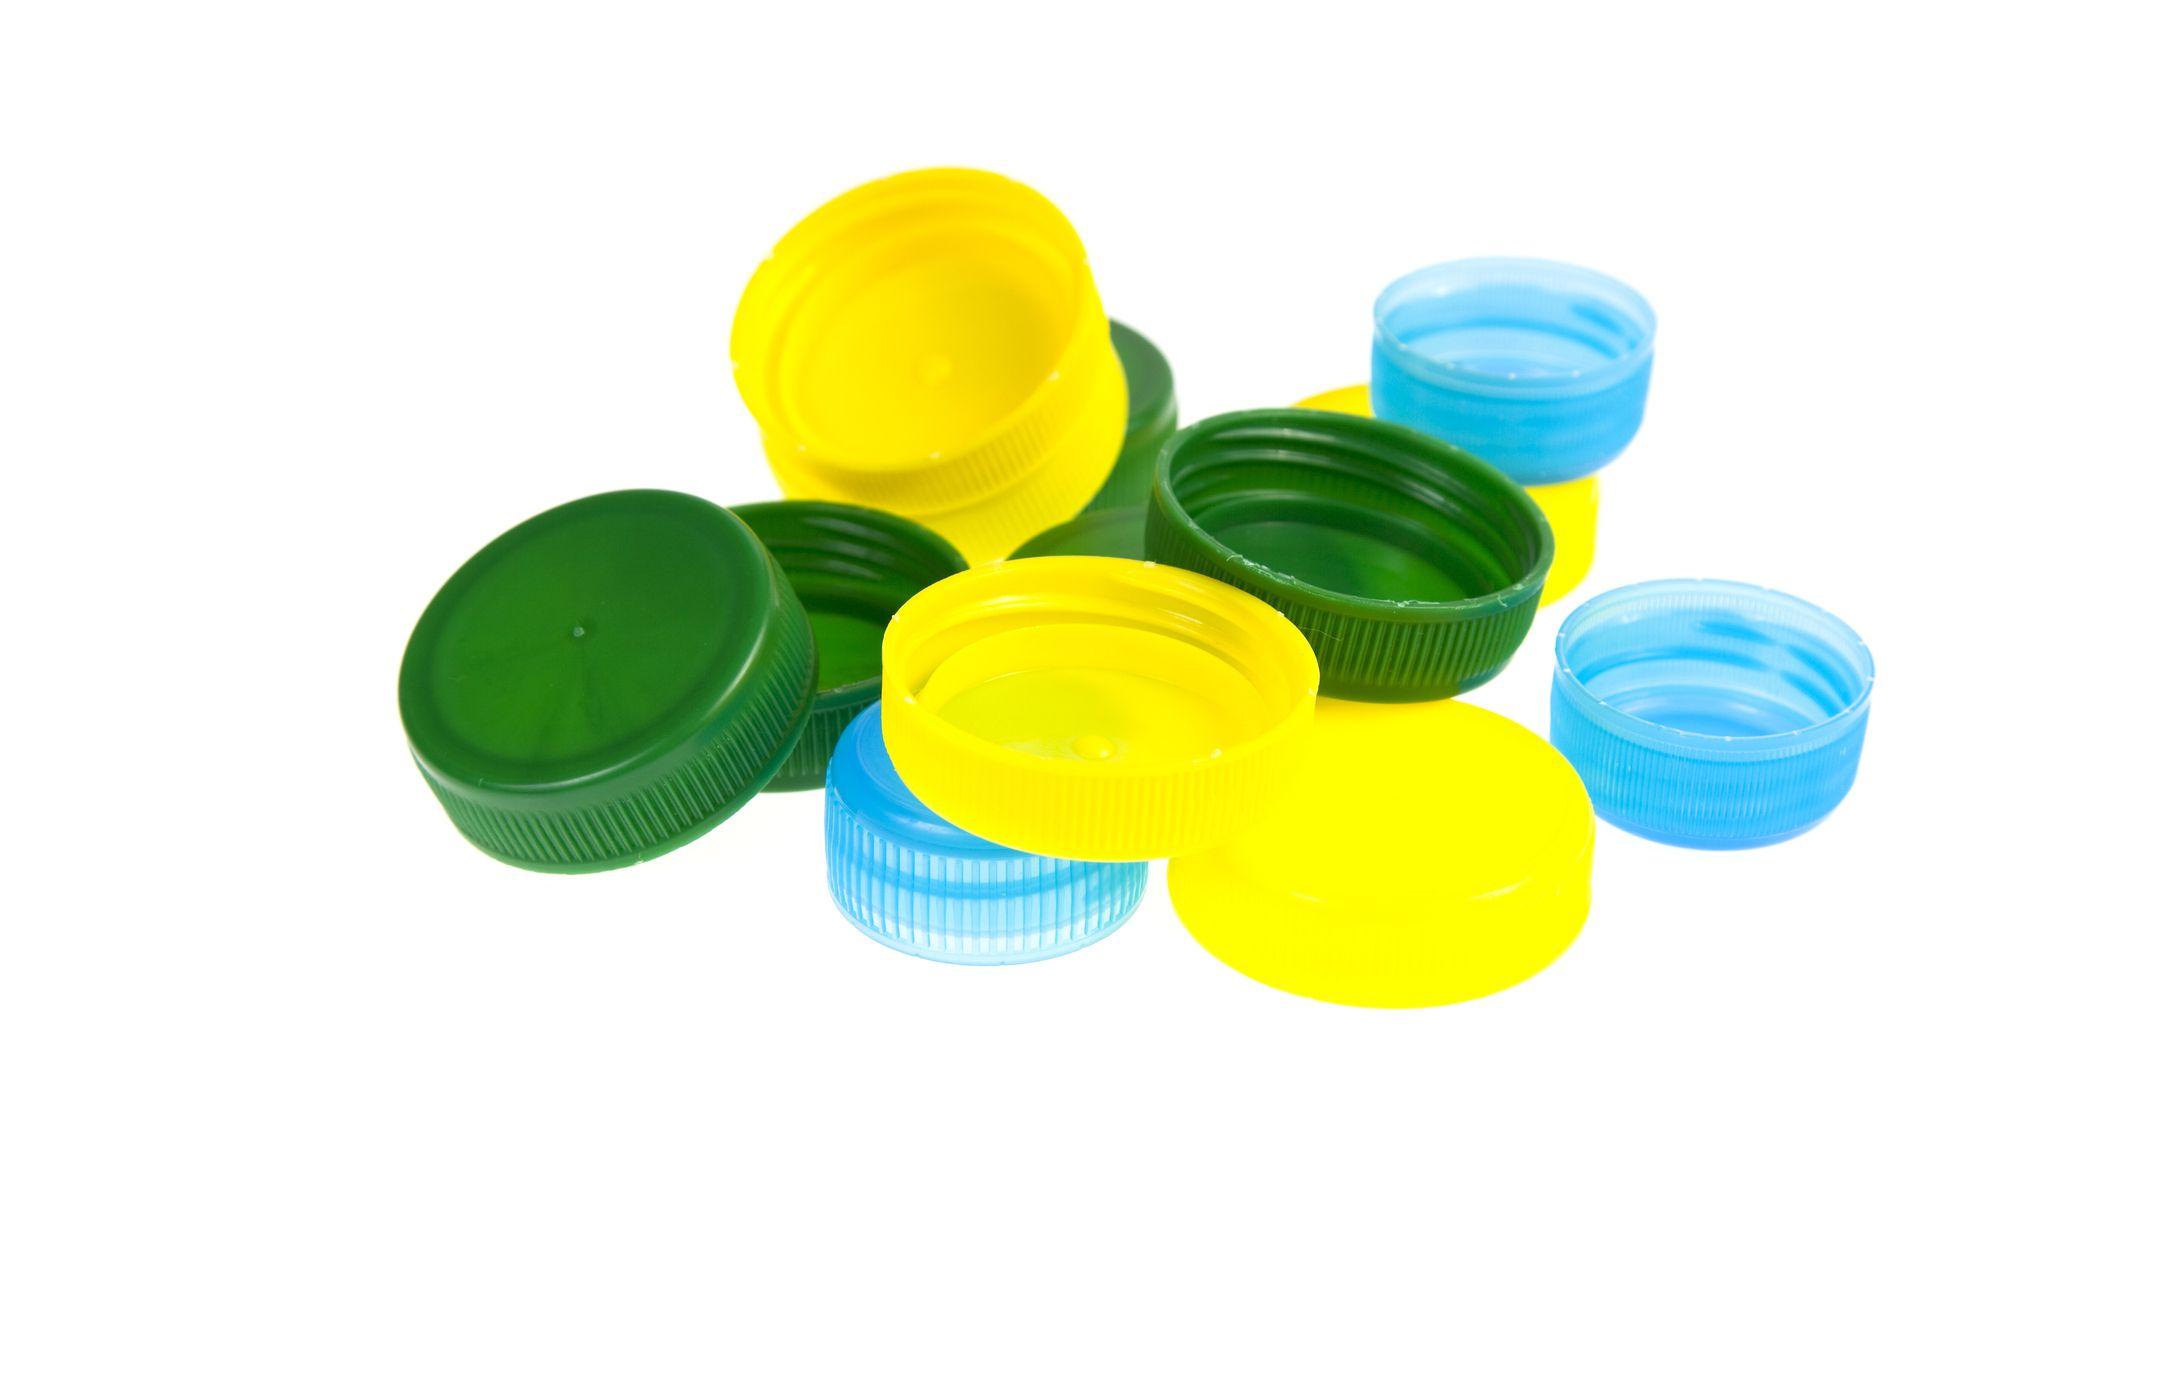 The Many Uses Of Pbt Plastics